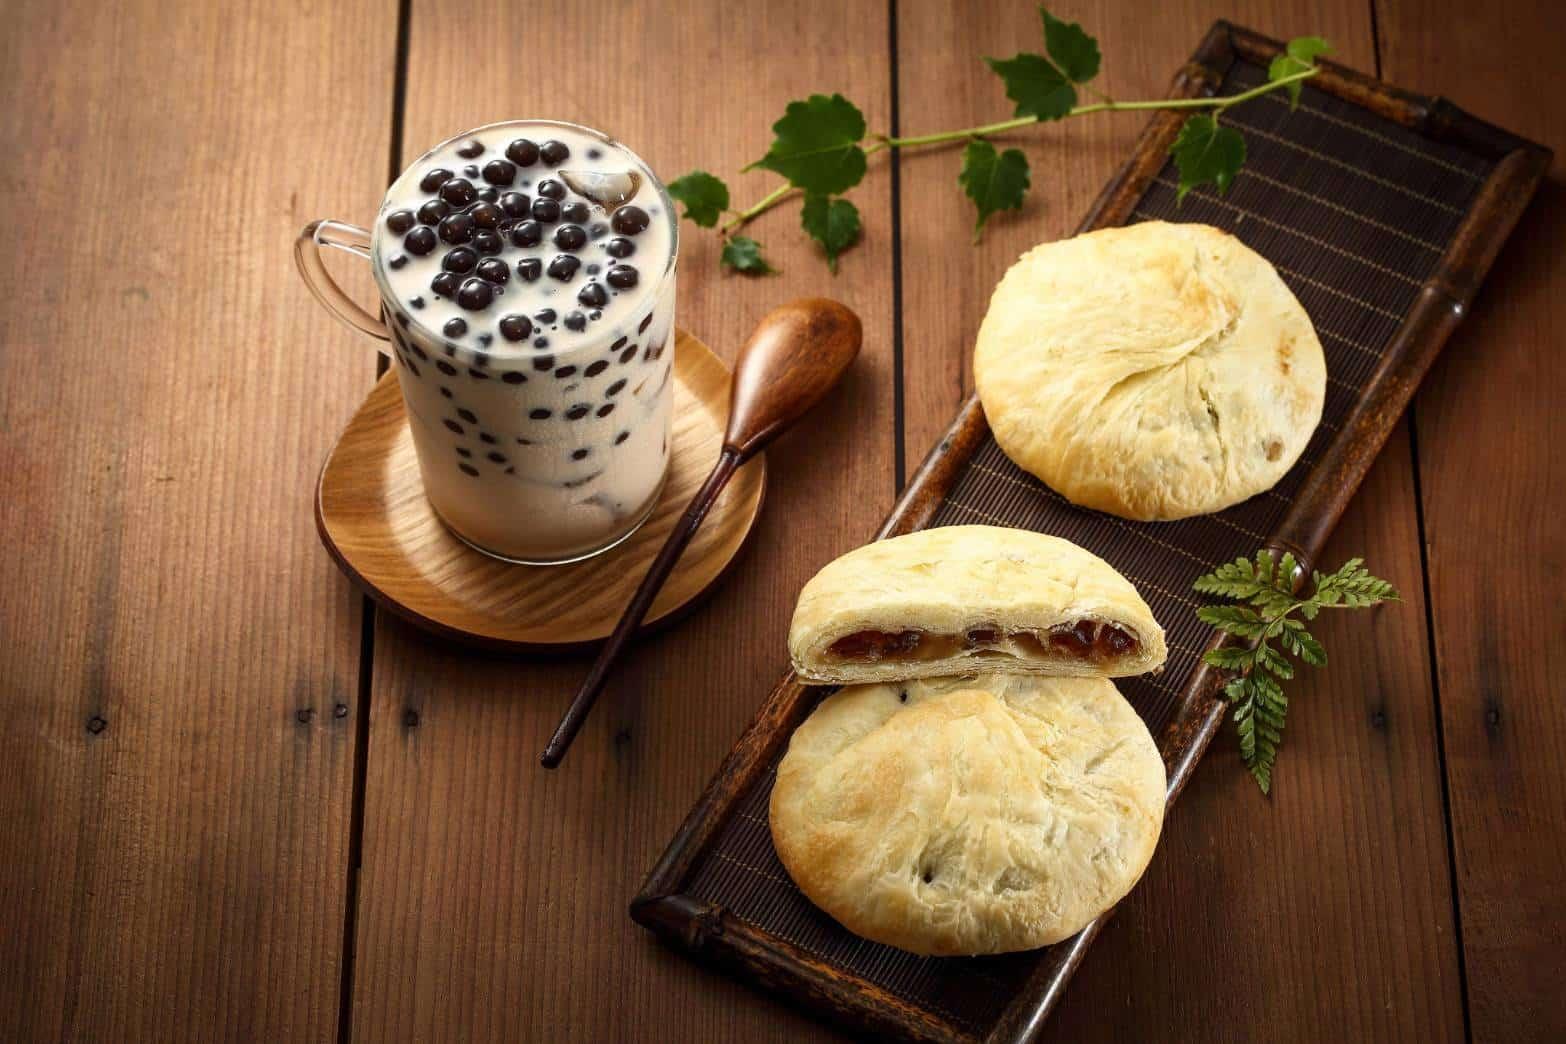 Read more about the article 台中旅遊這樣買!稱霸台中旅遊名產的超夯太陽餅系列